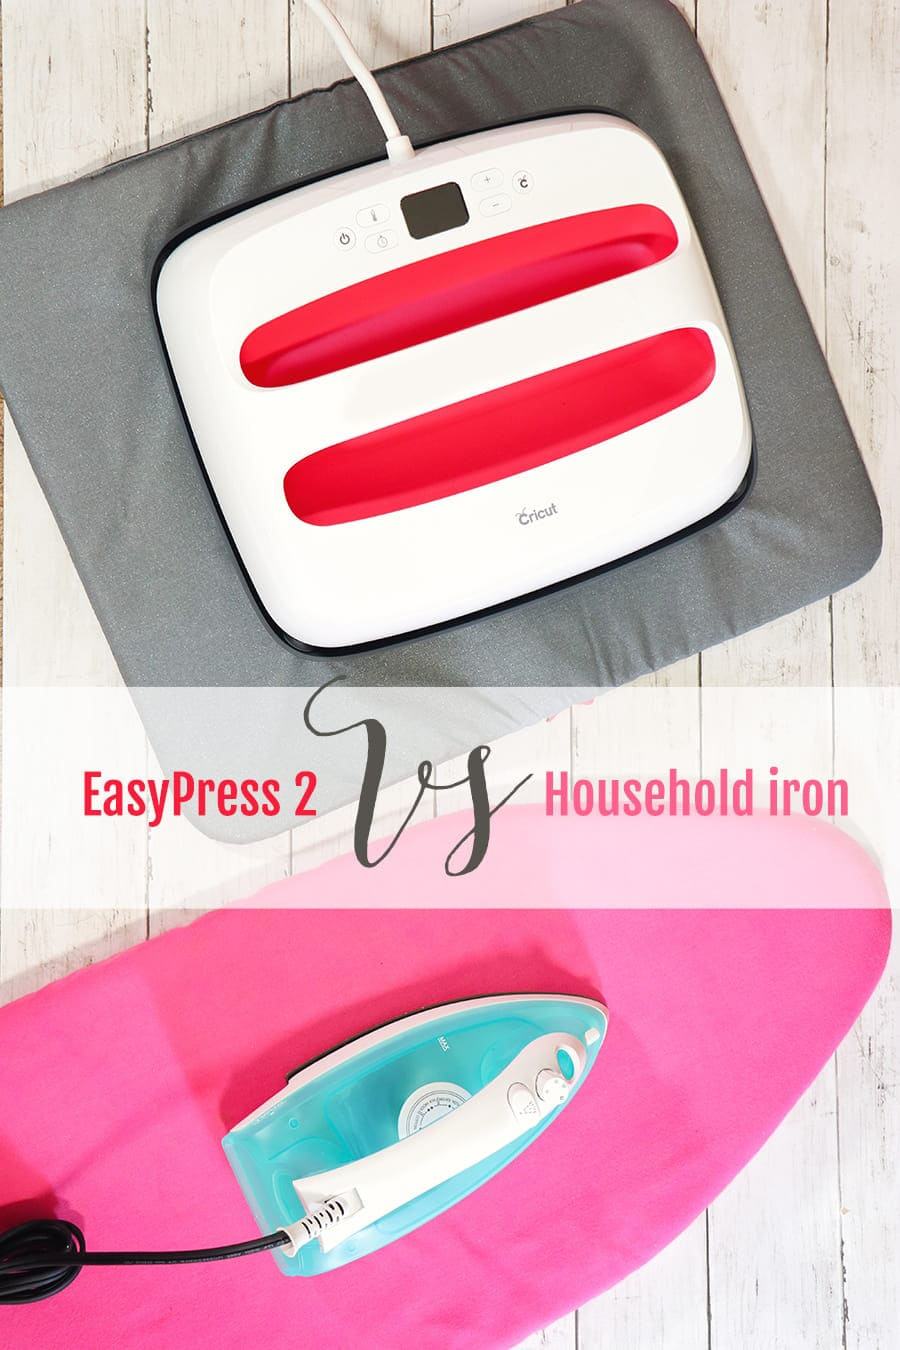 easypress 2 vs household camera